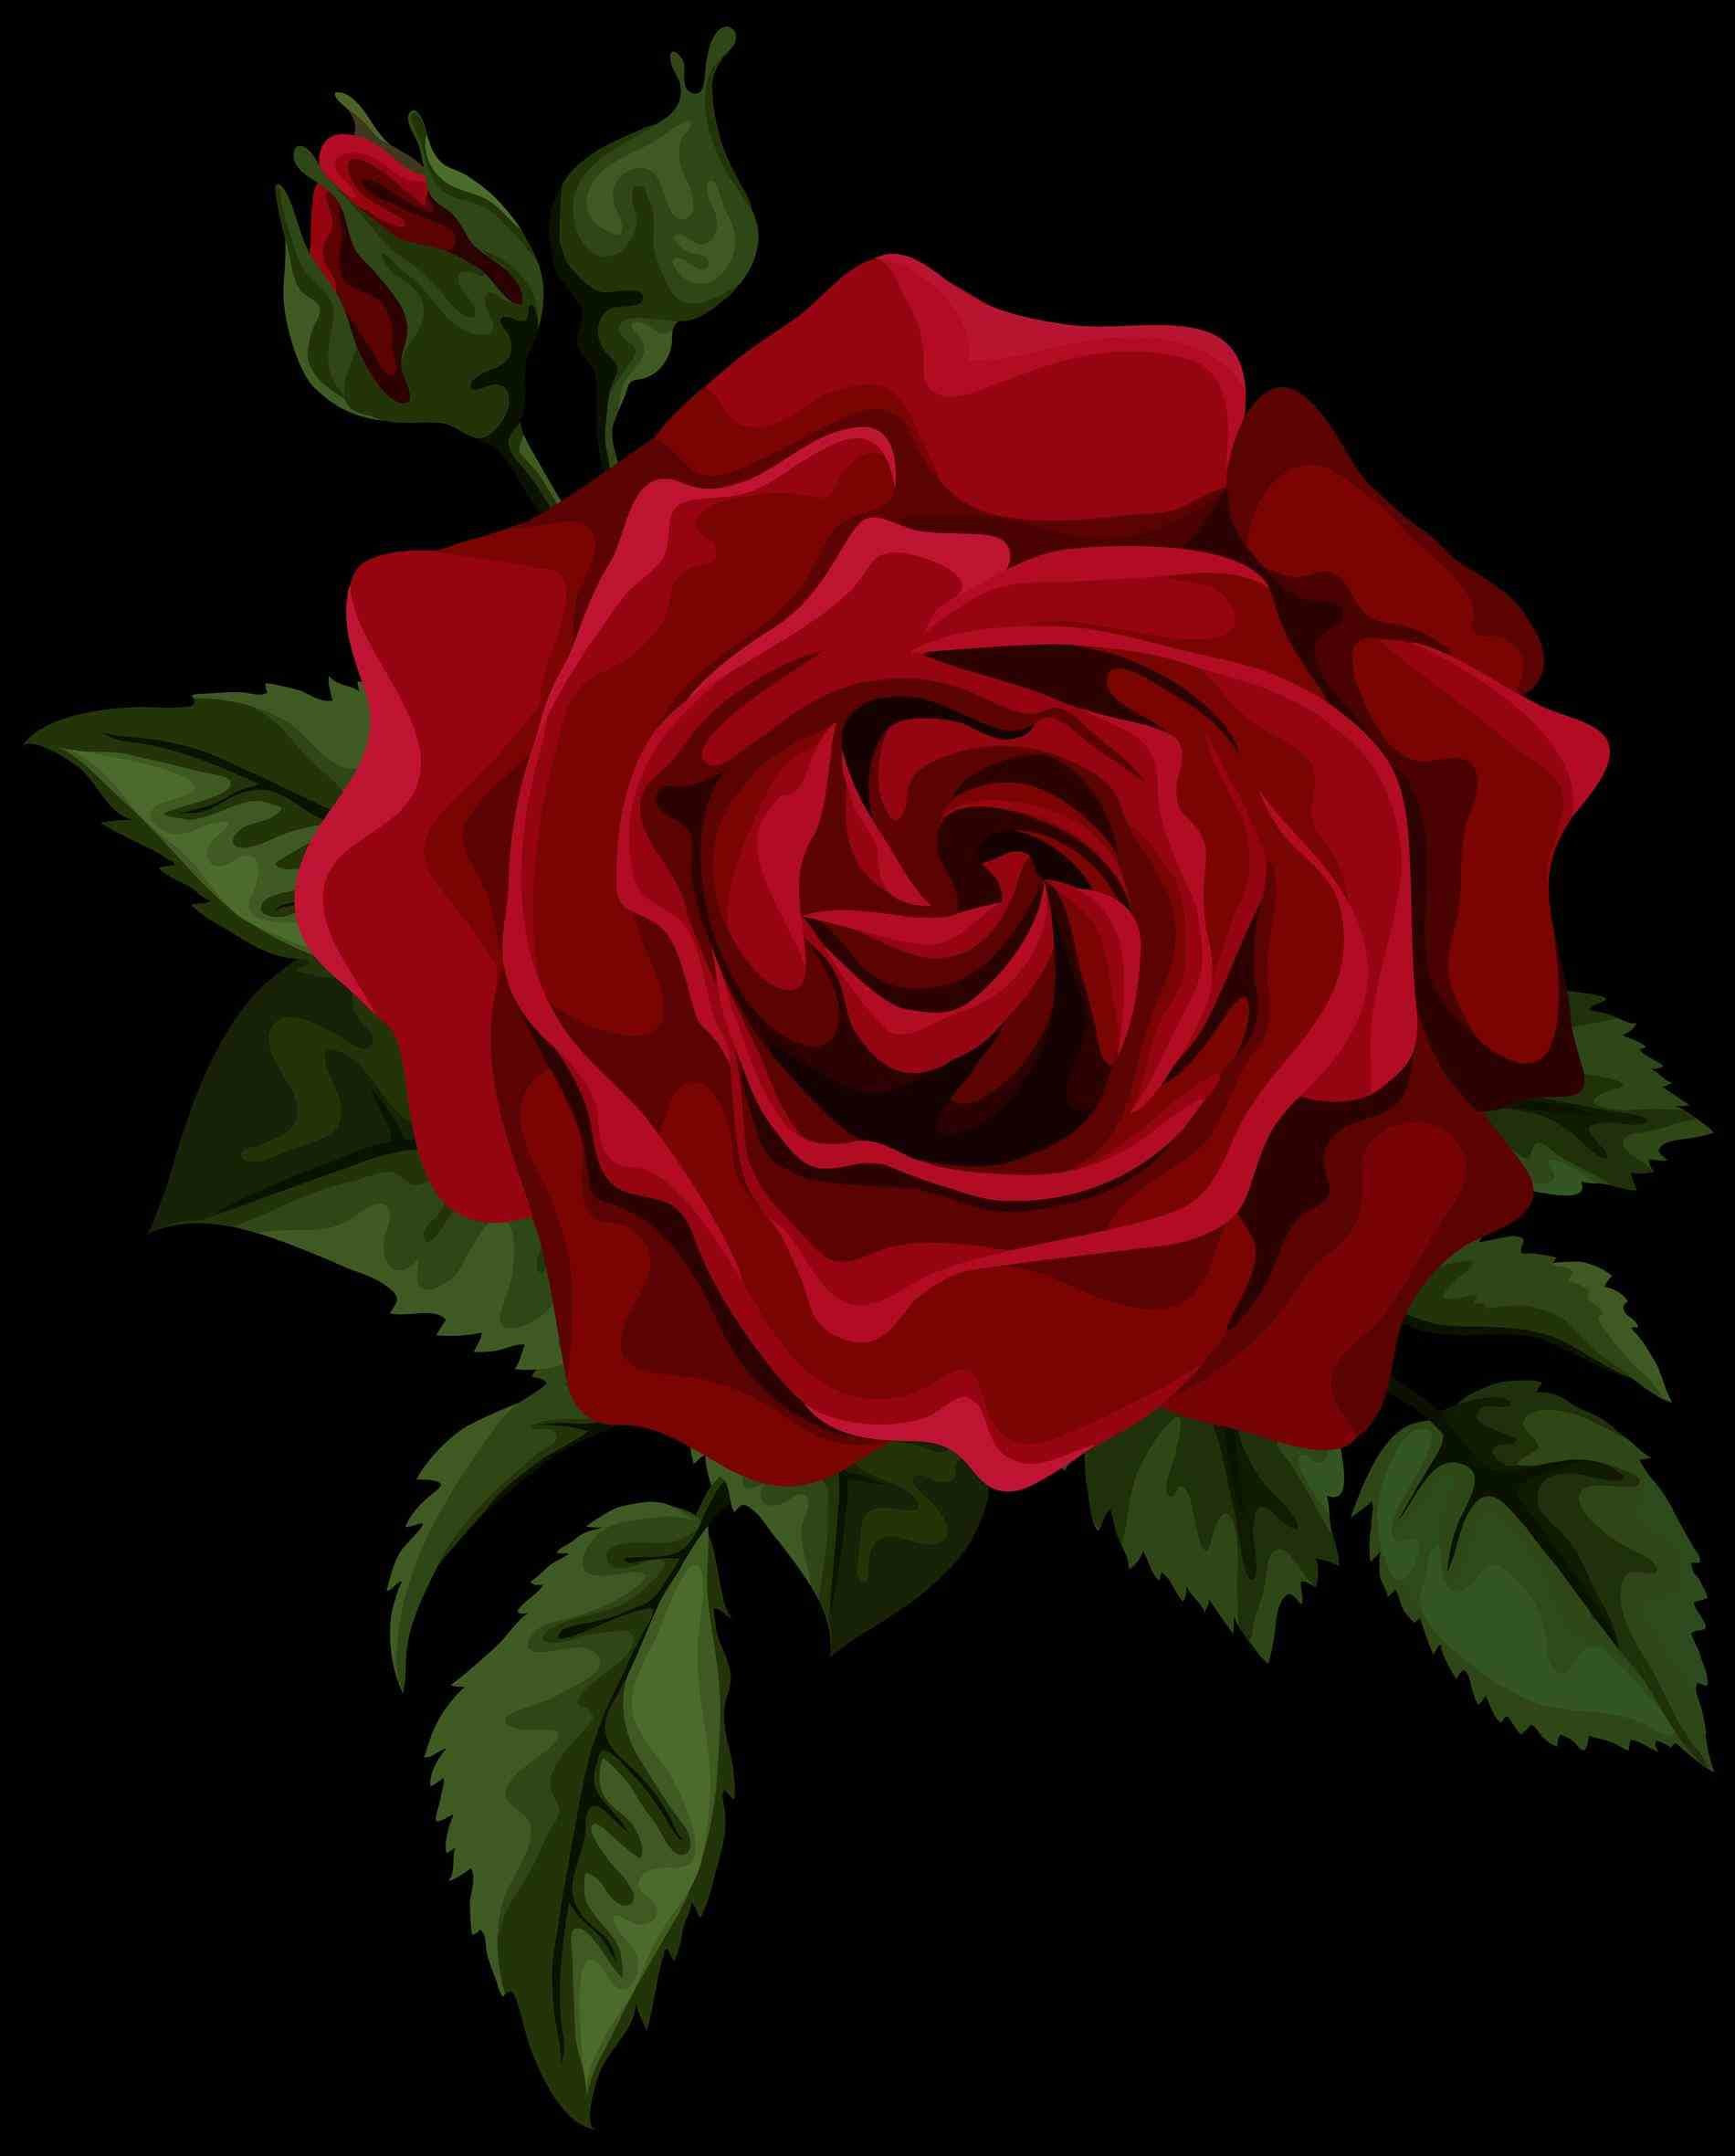 Download 980 Koleksi Wallpaper Tumblr Red Rose Gratis